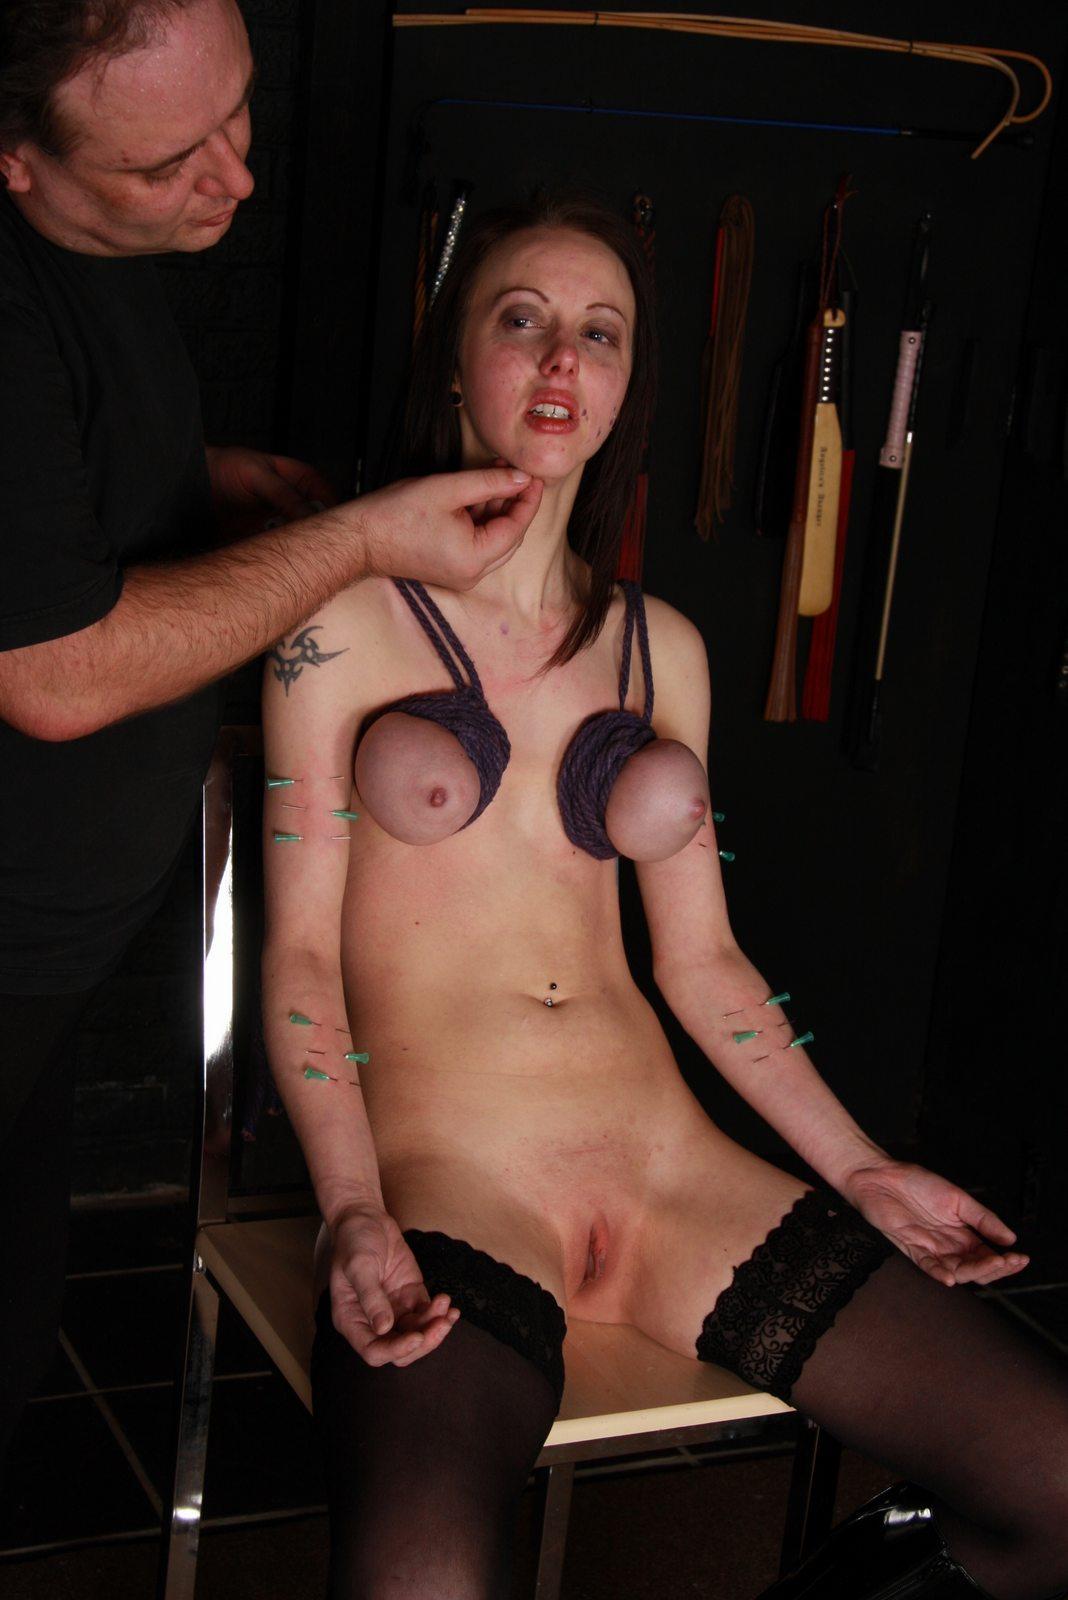 cock needle torture